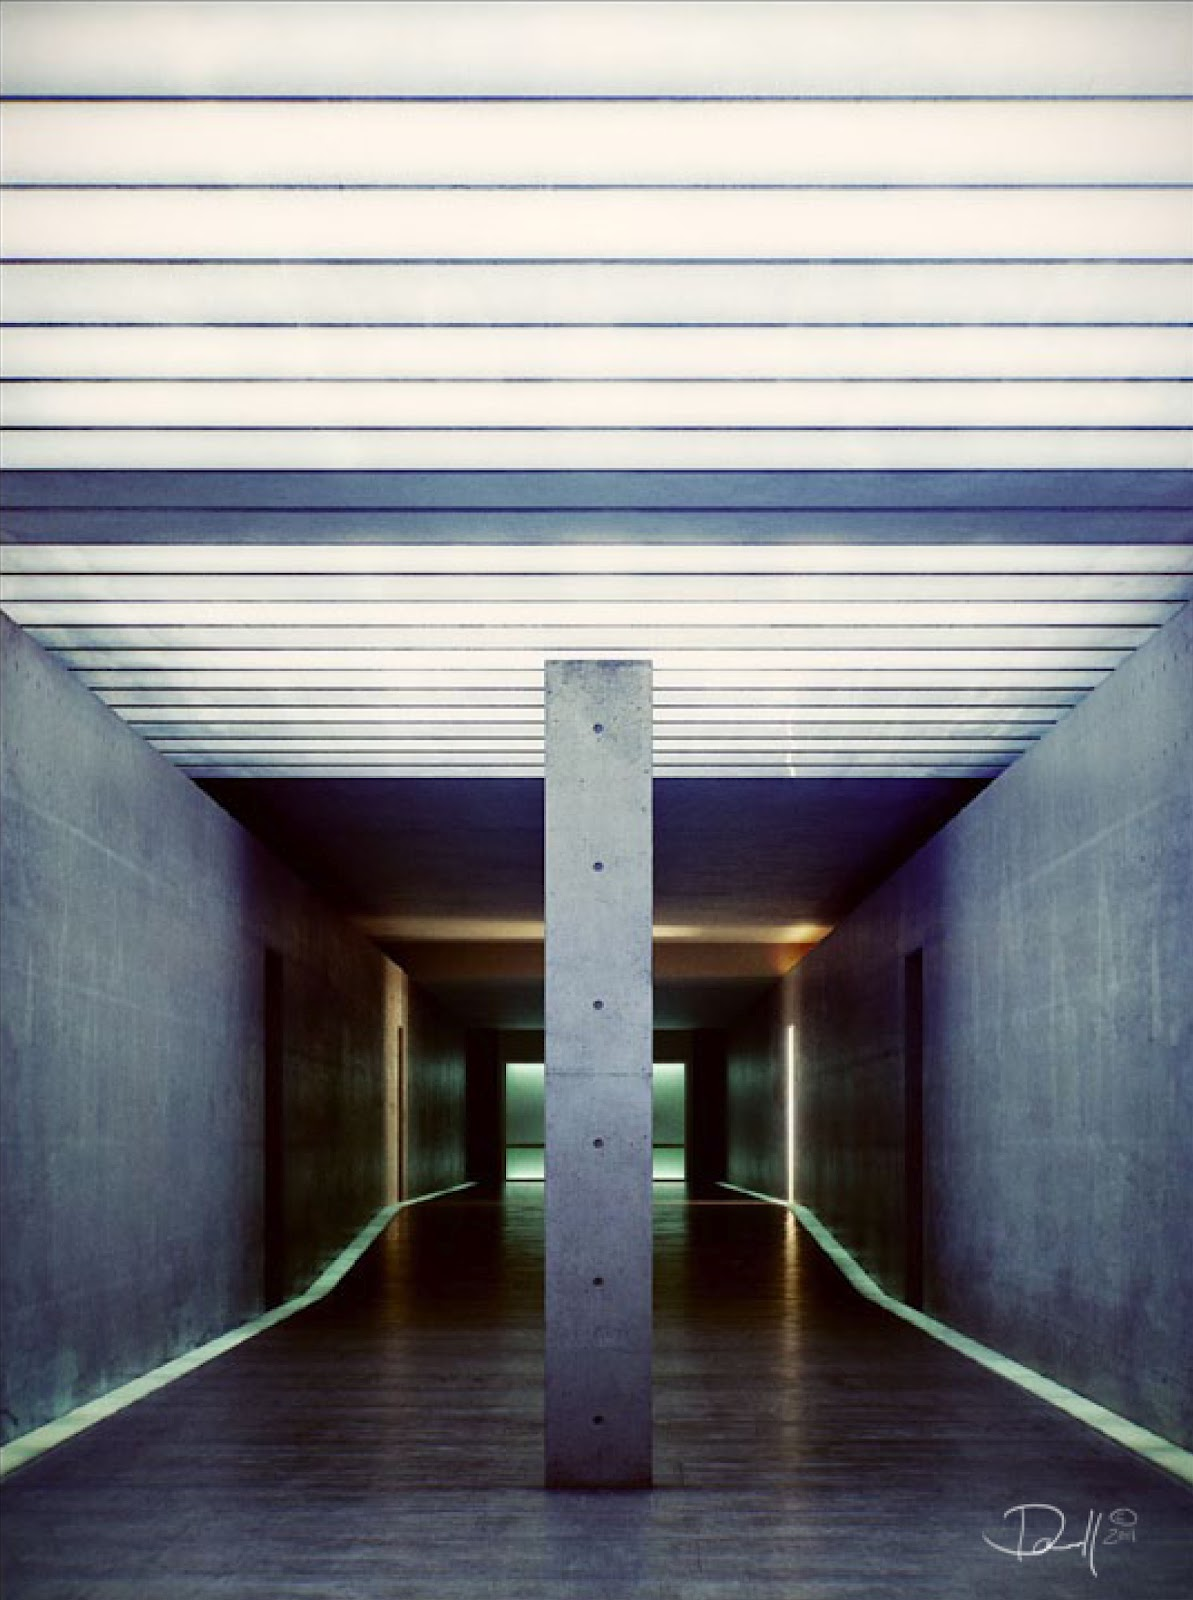 Ecomanta inson dubois wood top interior designer in new for Best interior designers in new york